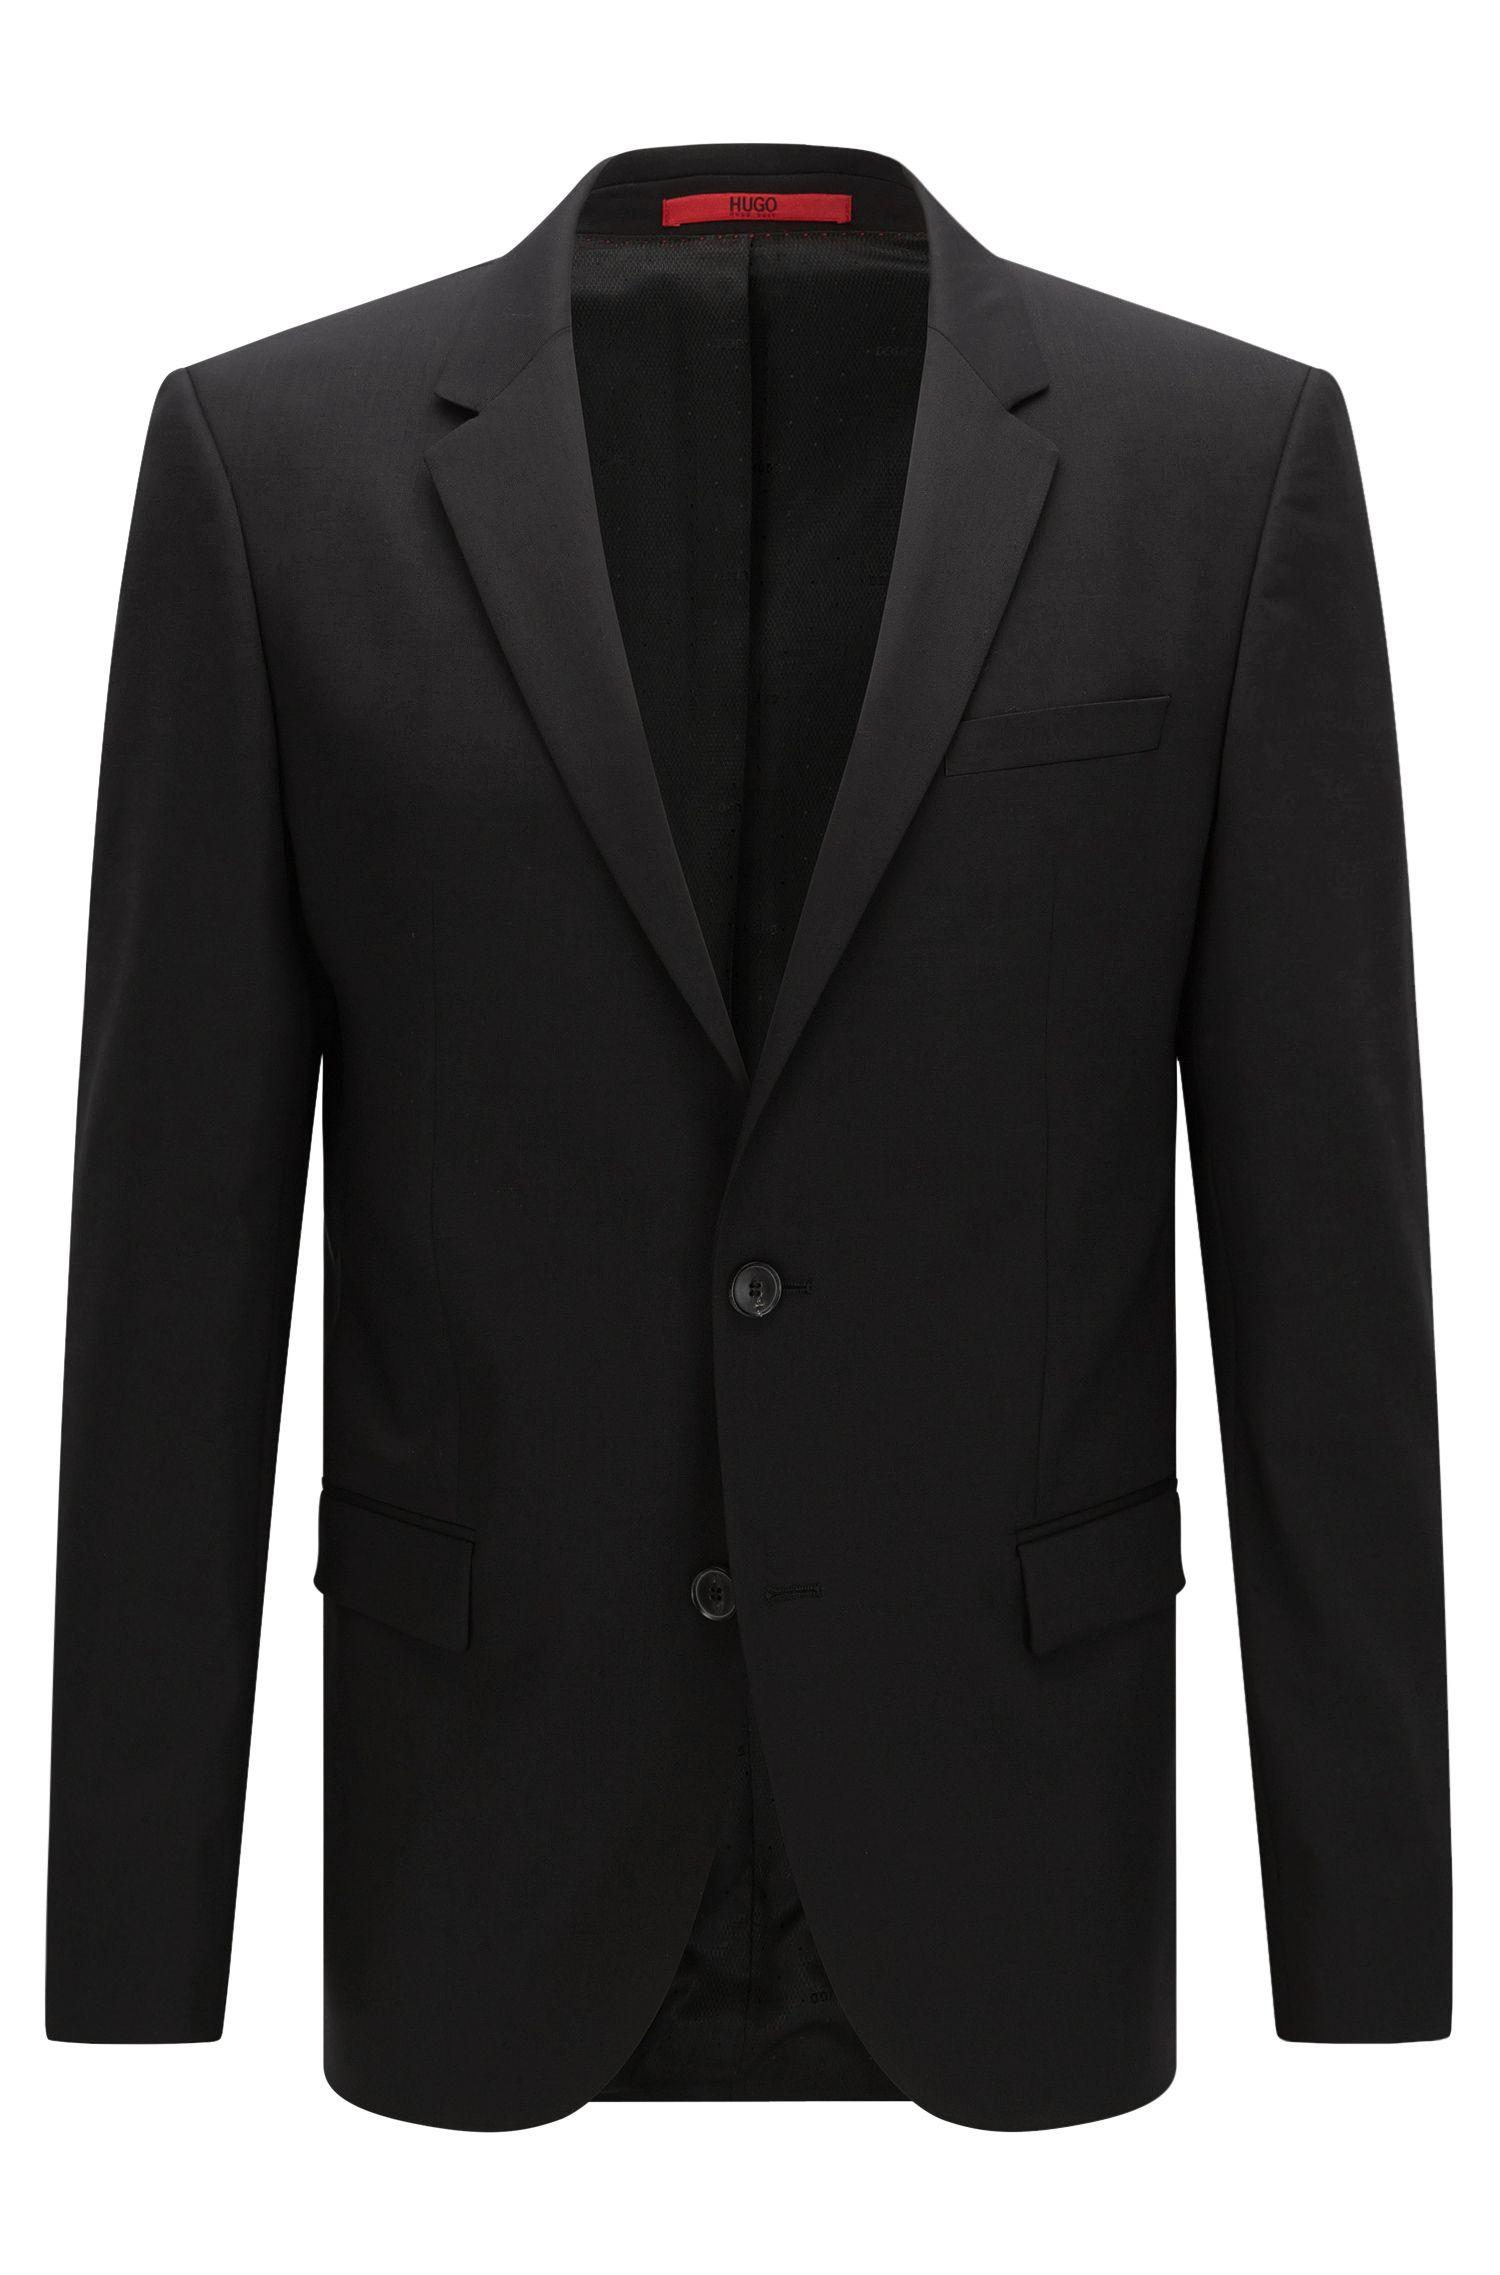 Slim-fit suit jacket in a wool blend